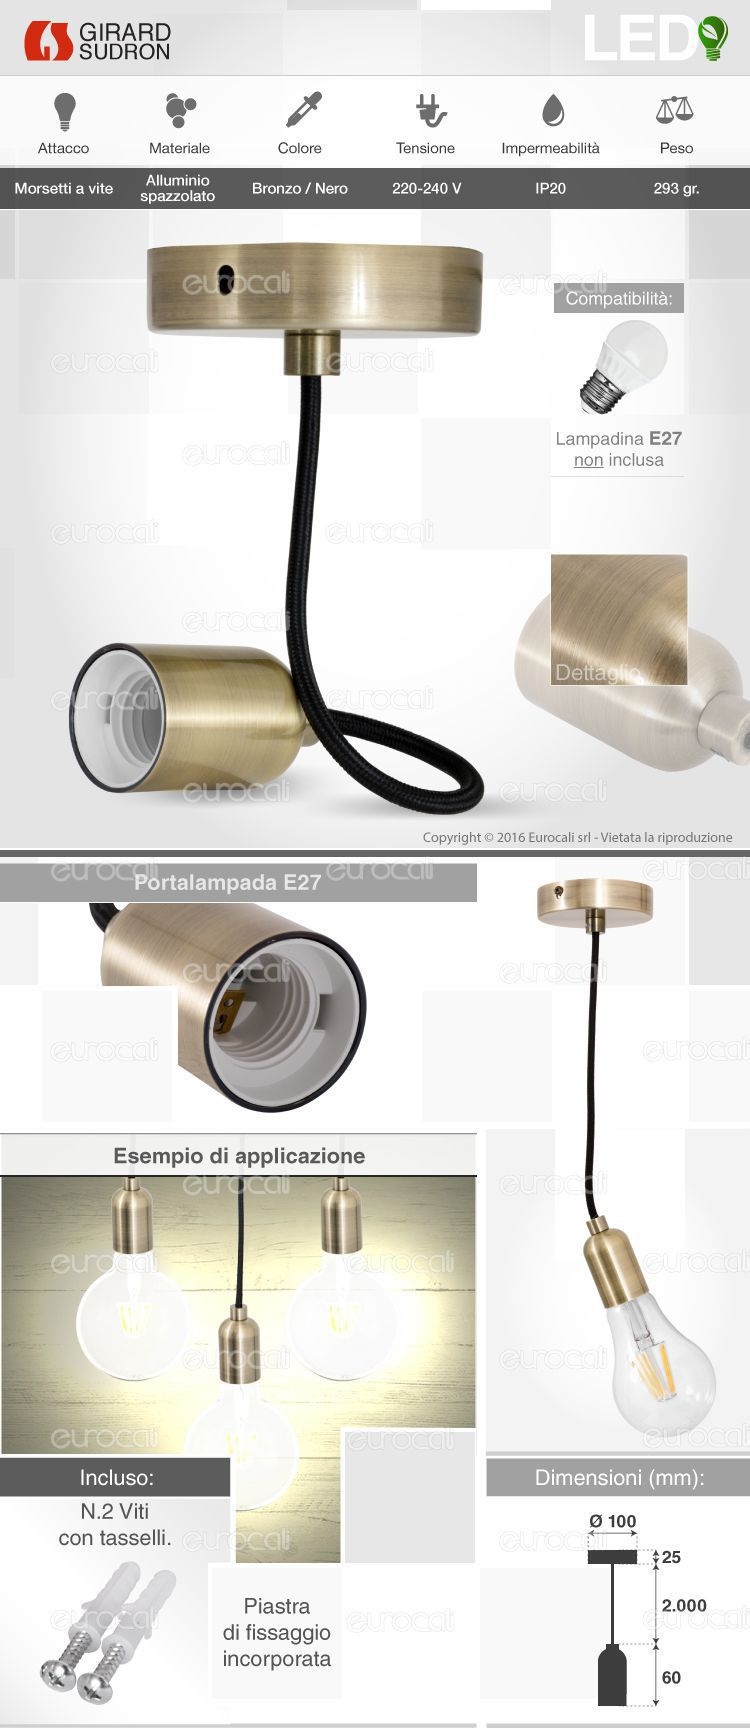 Porta lampada lampadario Girard Sudron